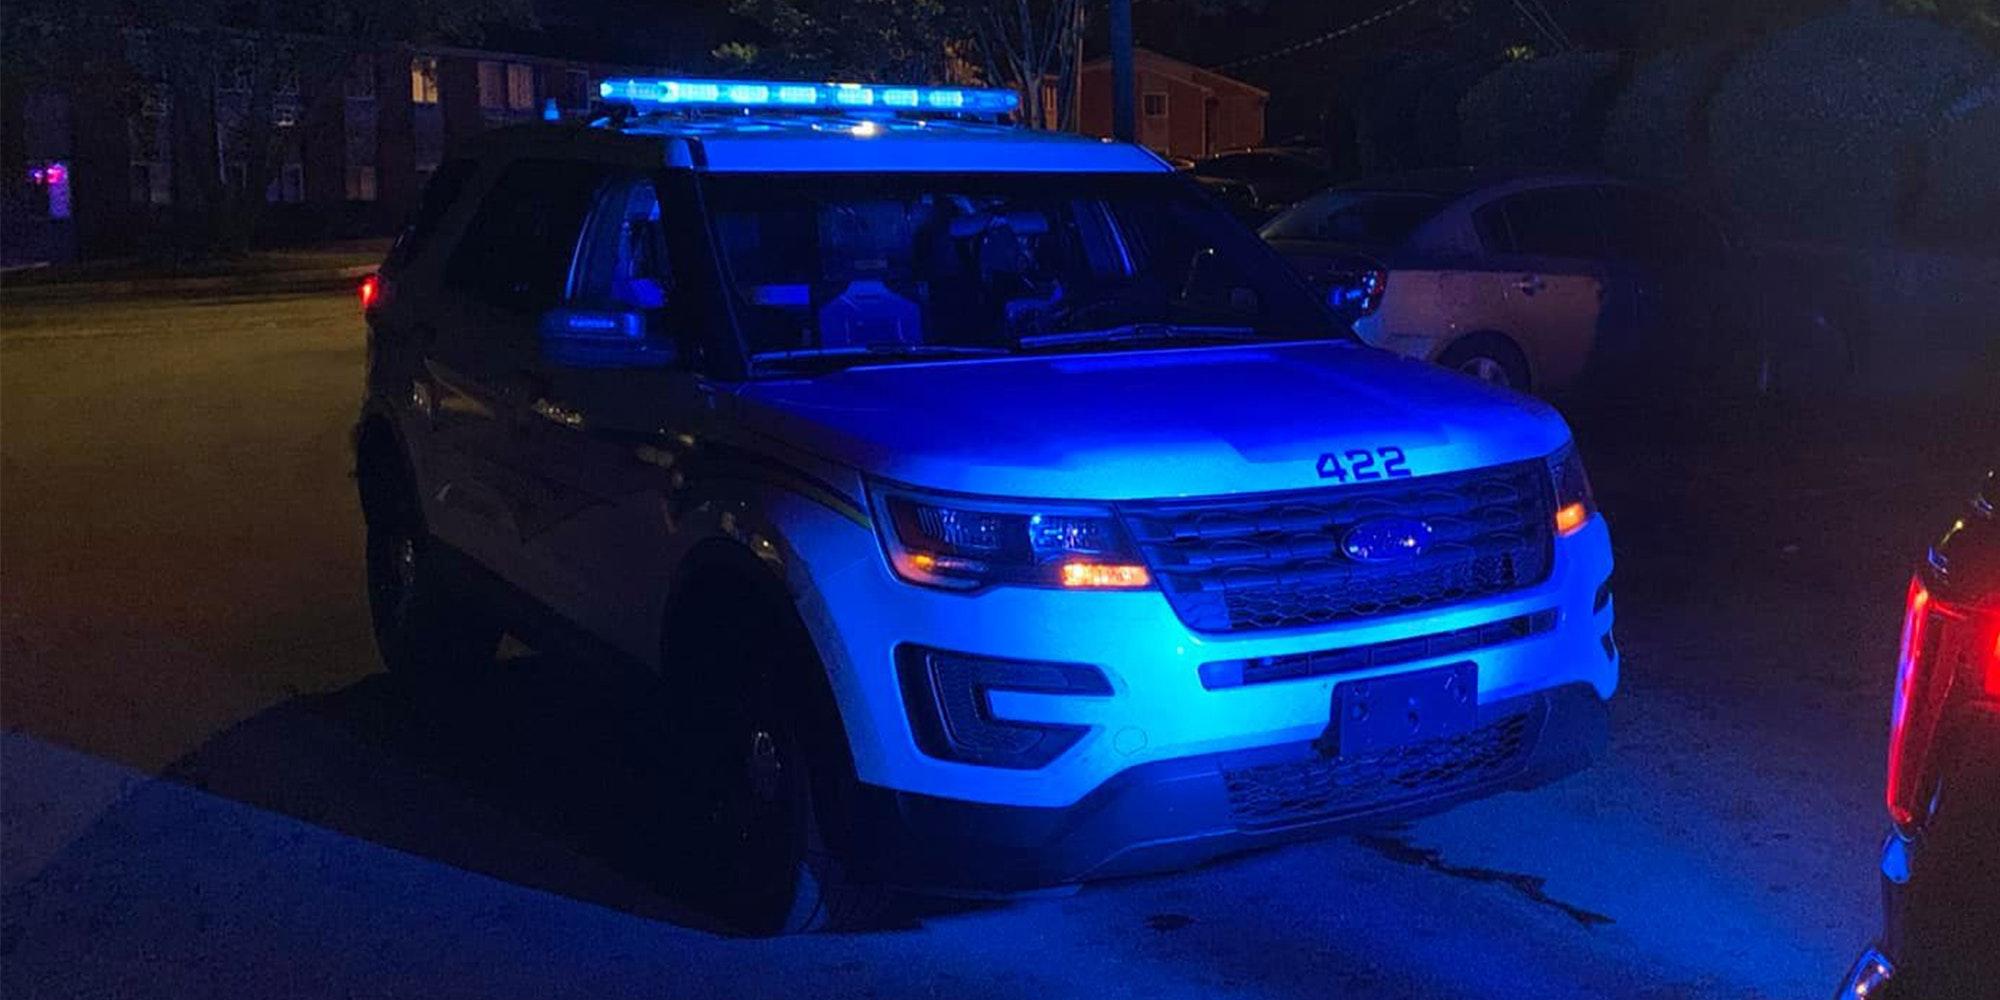 birmingham police car at night